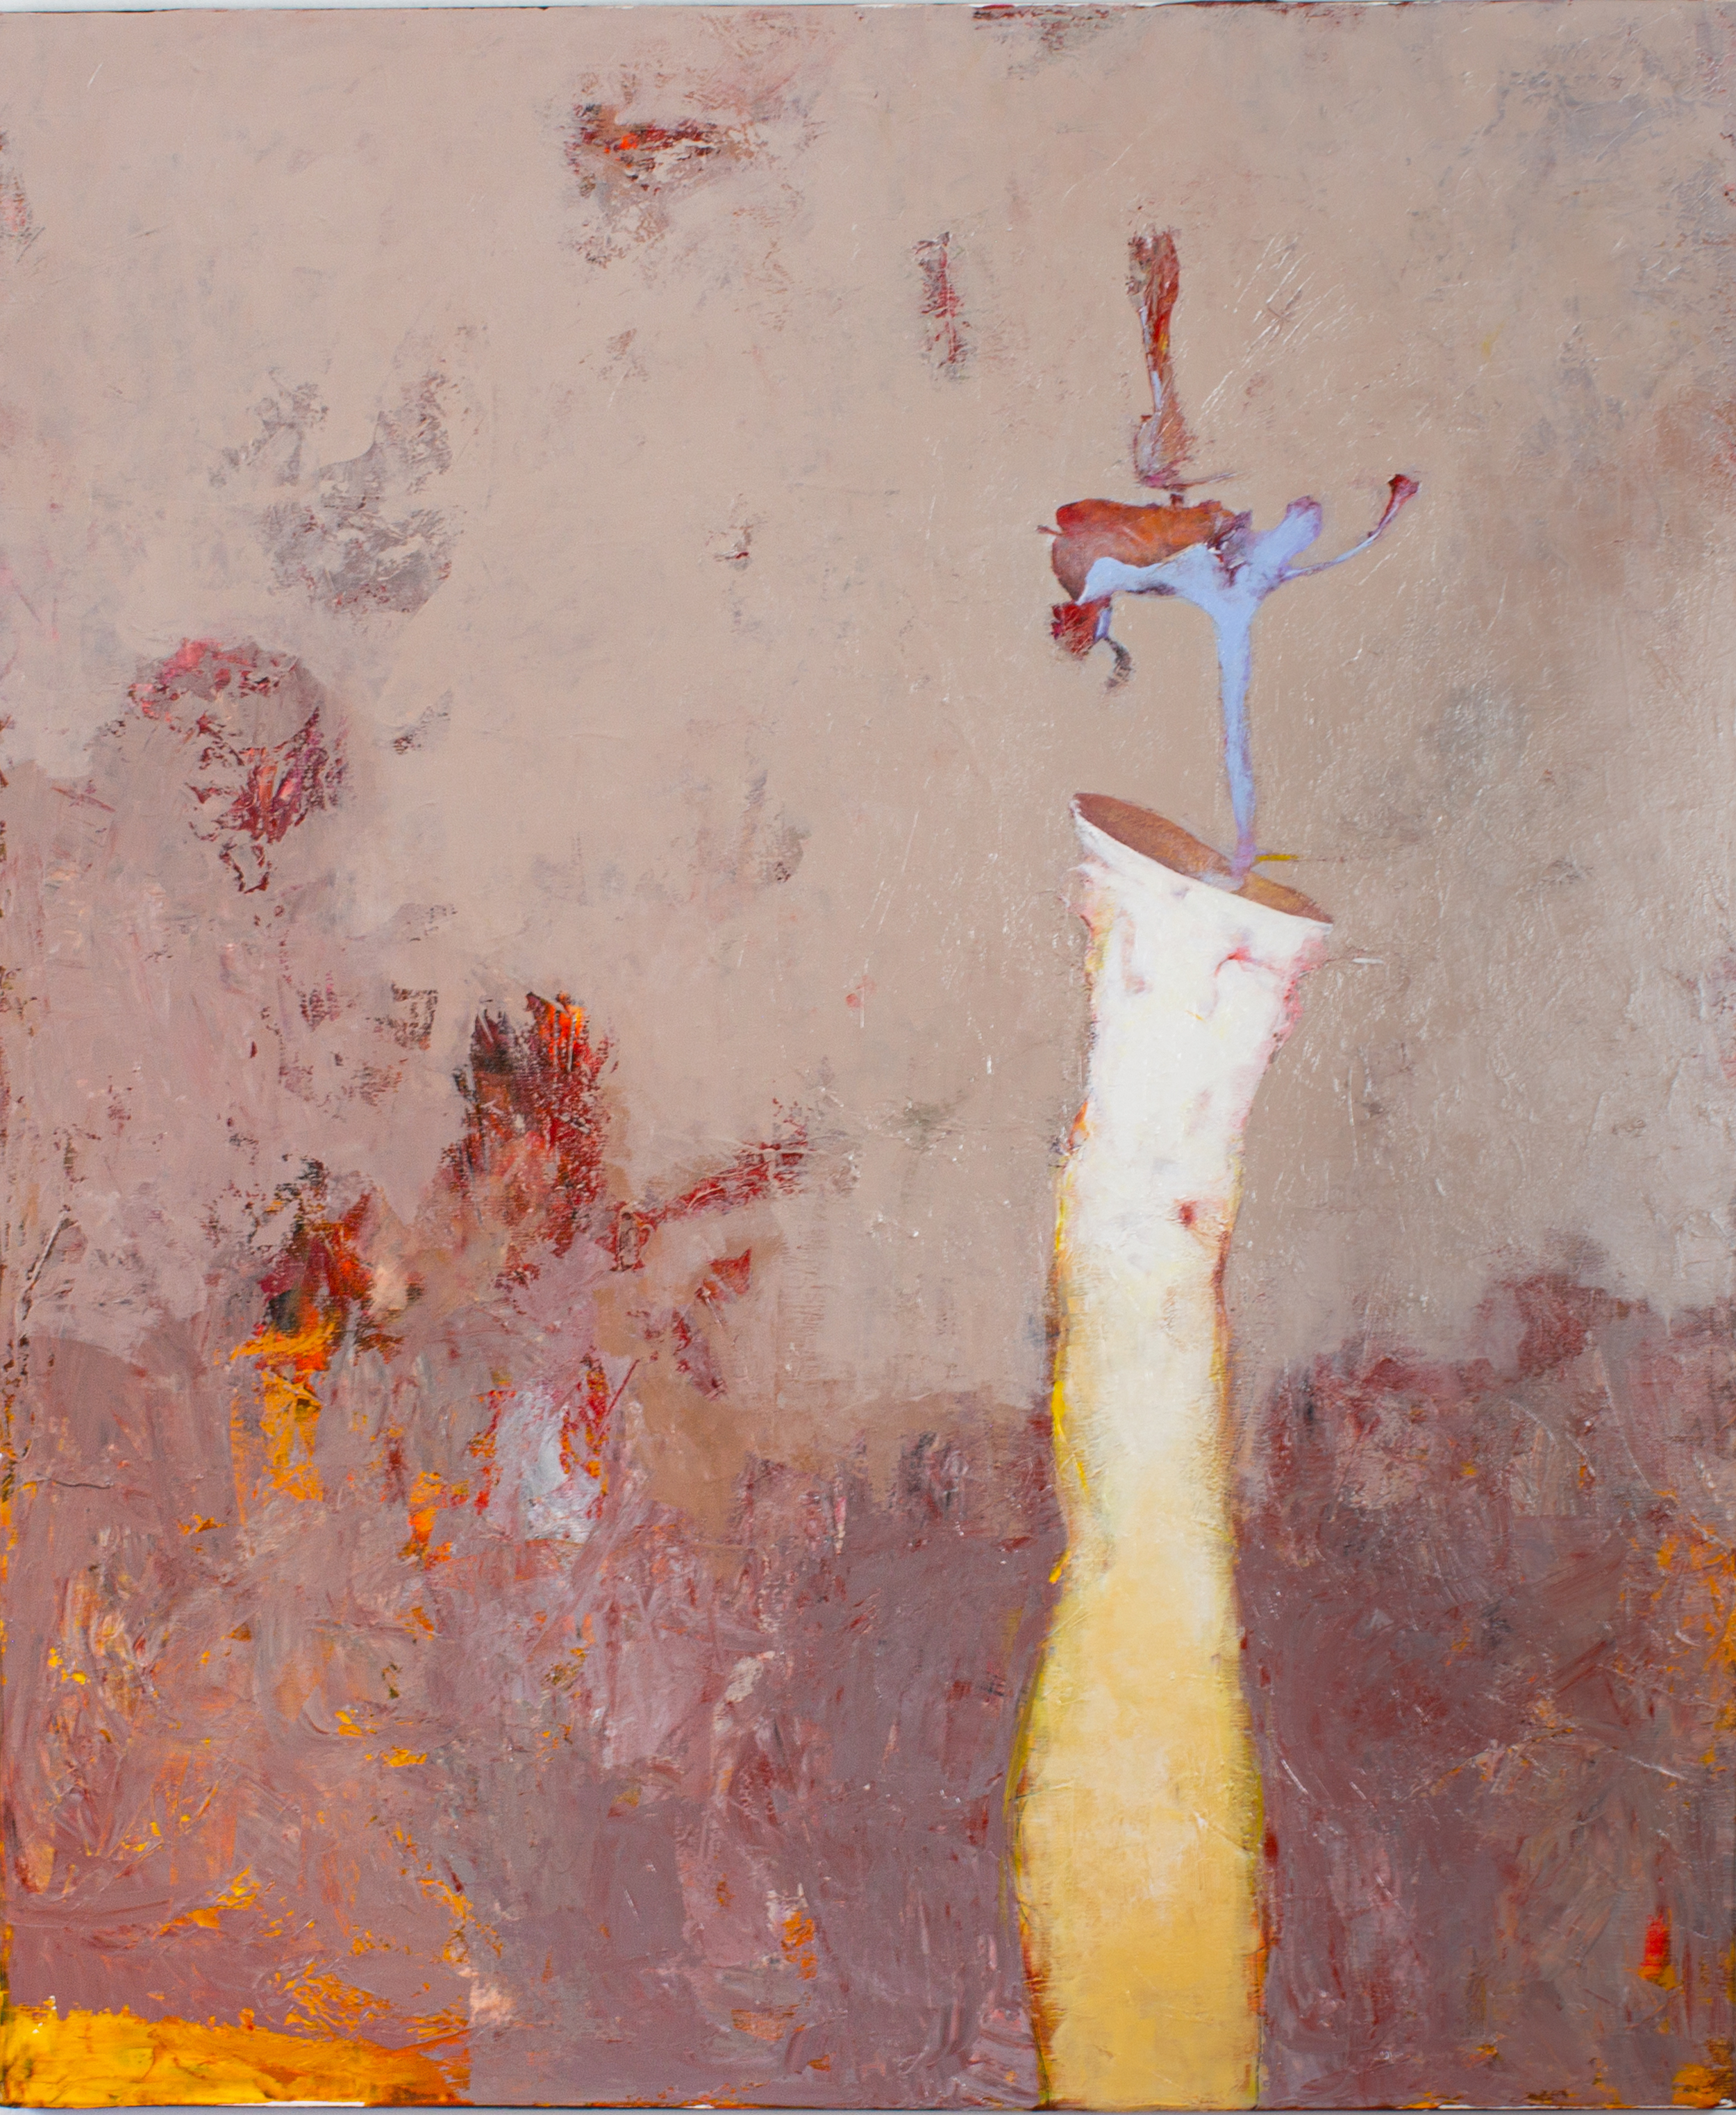 Oleg Bondarenko - Organic vase II, oil painting